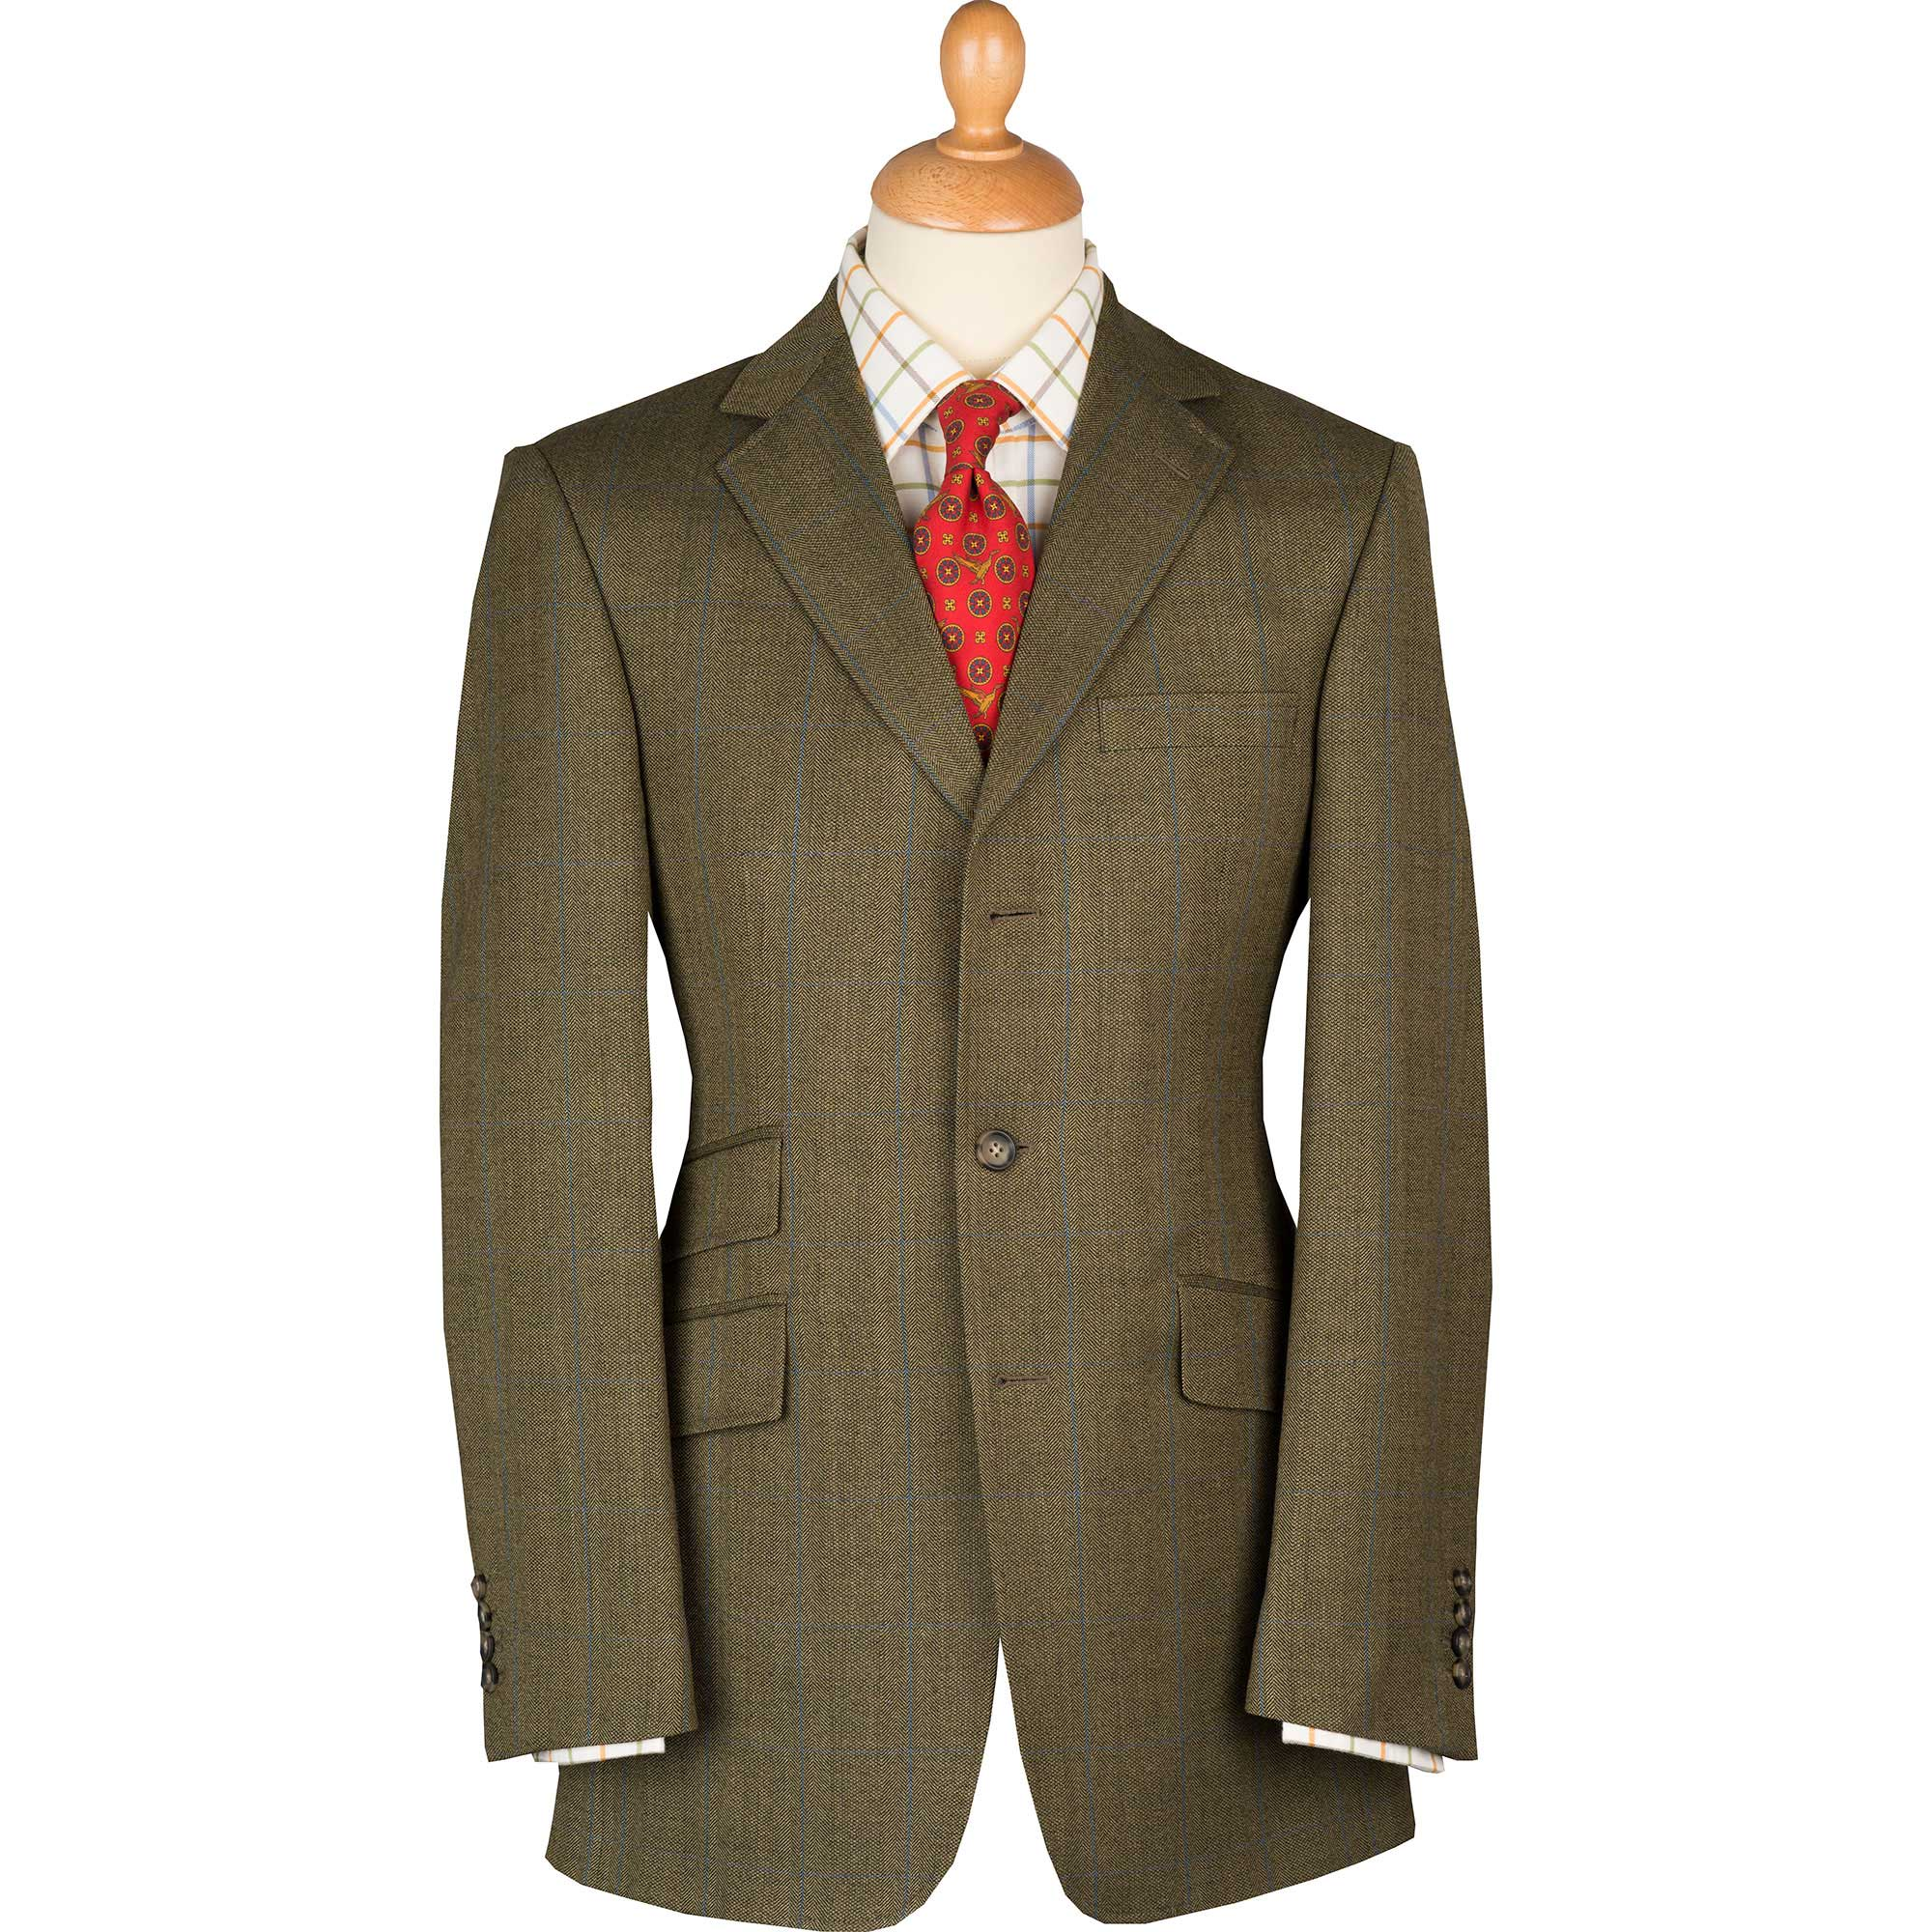 3e8514f4e Elland Lightweight Tweed Jacket